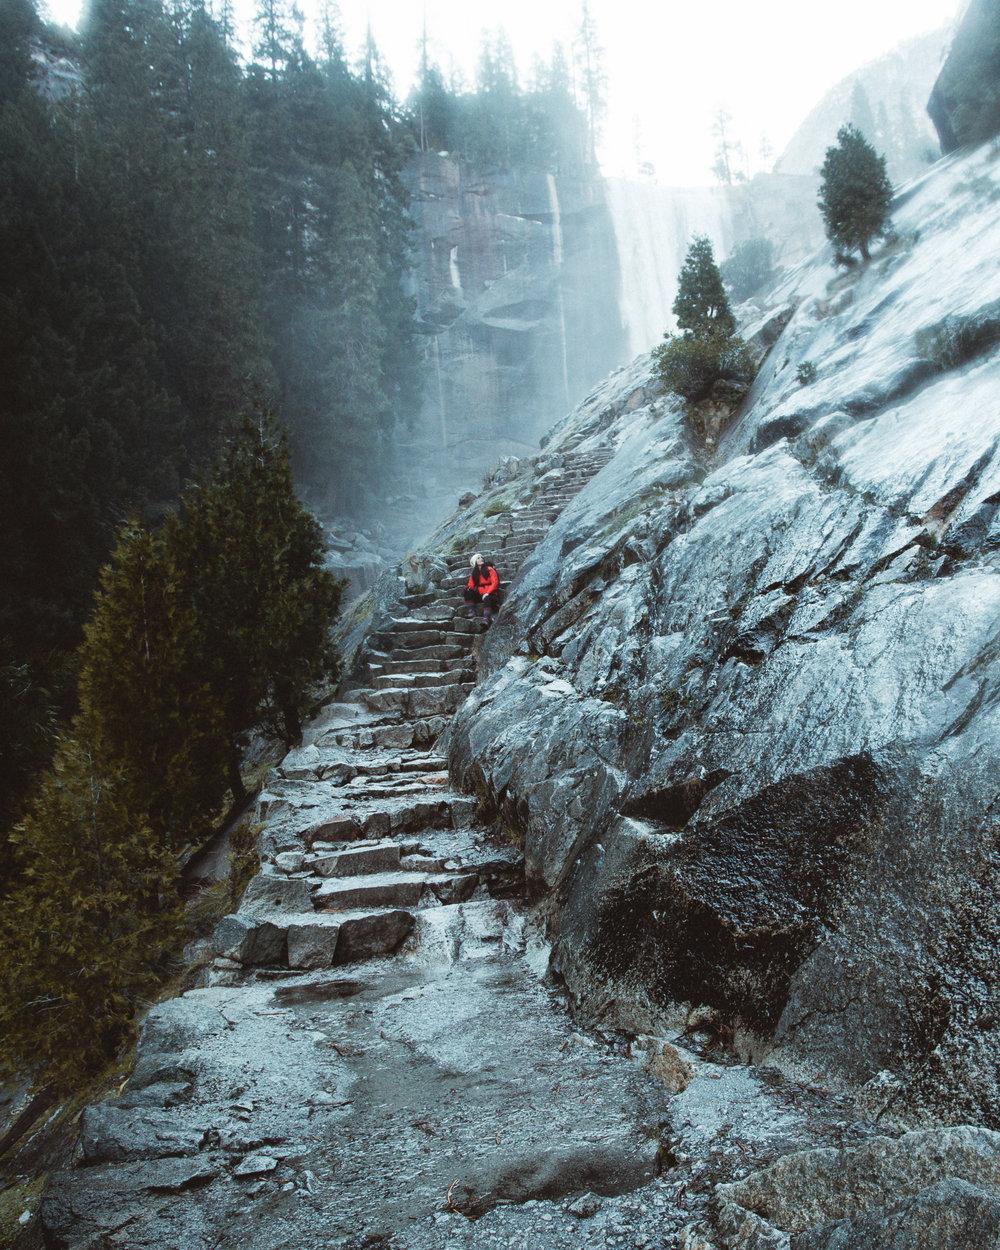 Hiking to Vernal Fall via the Mist Trail